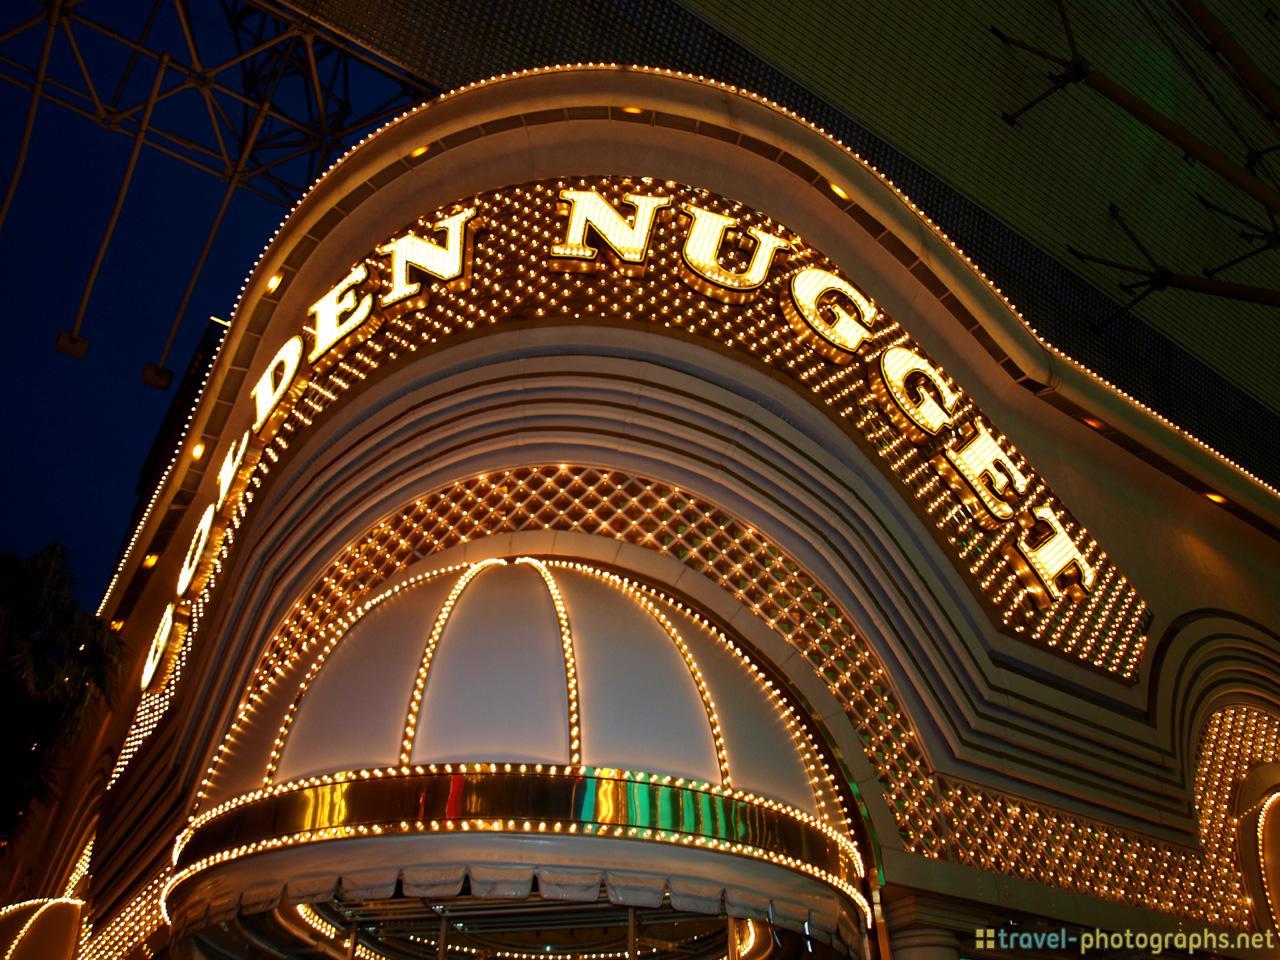 golden nugget online review